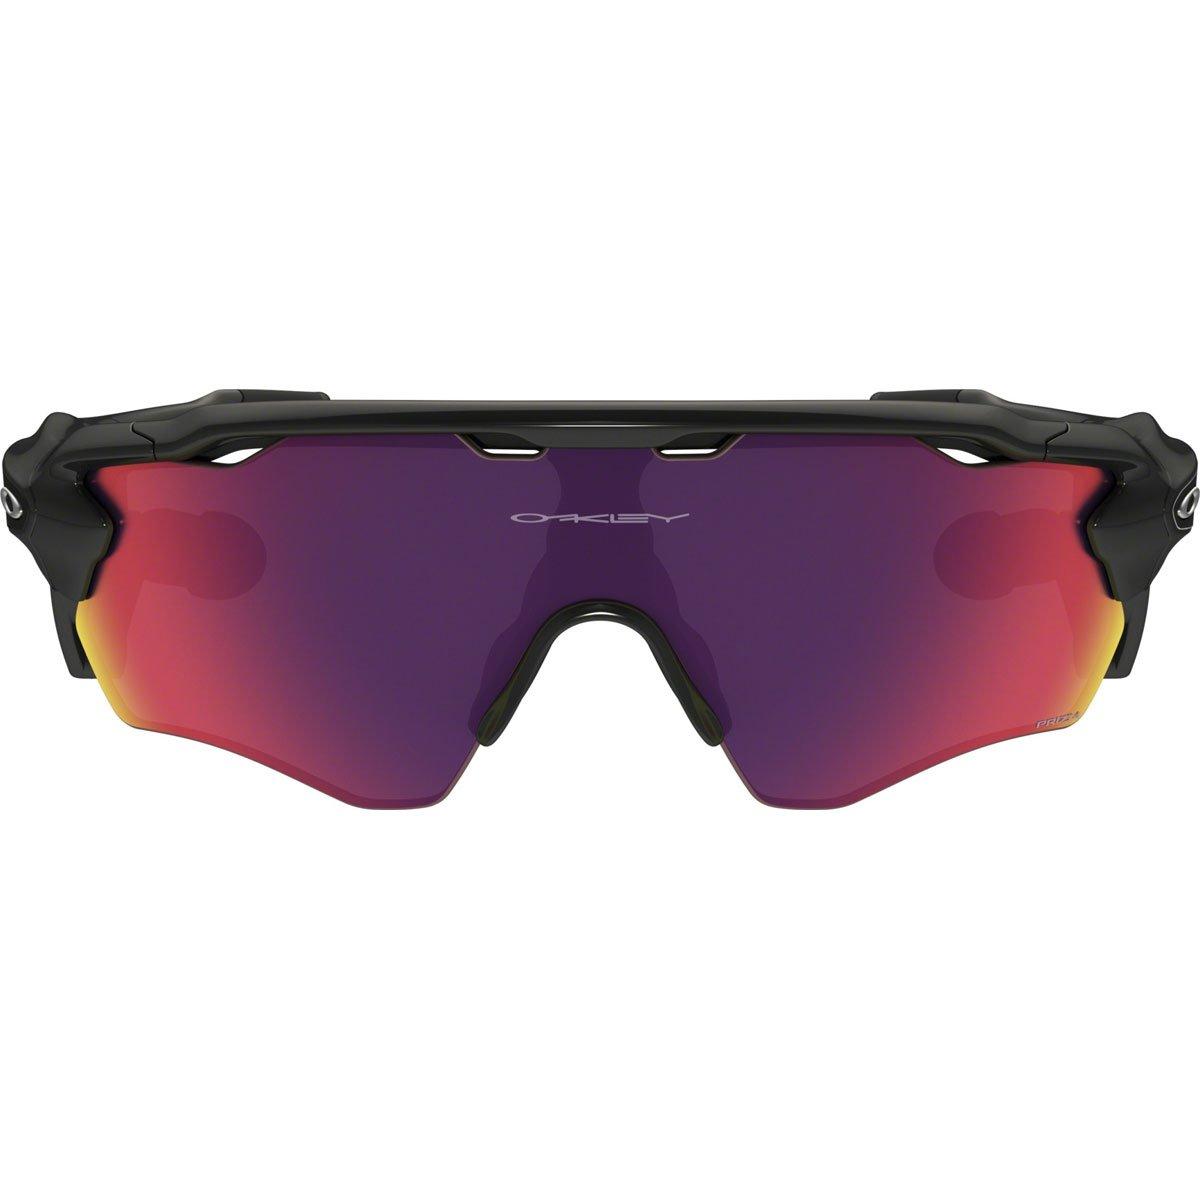 ad54b3c078 Oakley Radar Pace Polarized Sunglasses - TiendaMIA.com